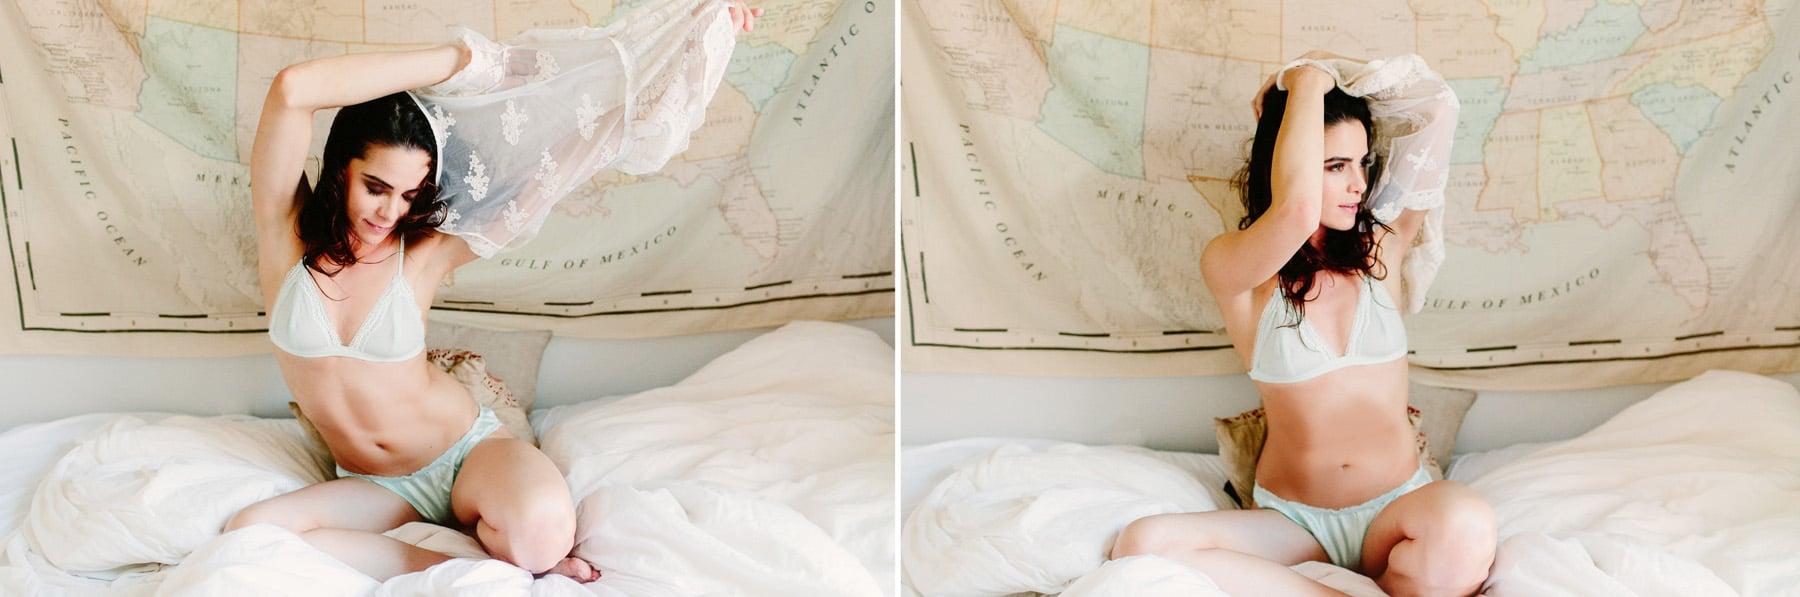 claireloveslove_romantic boudoir_008.jpg